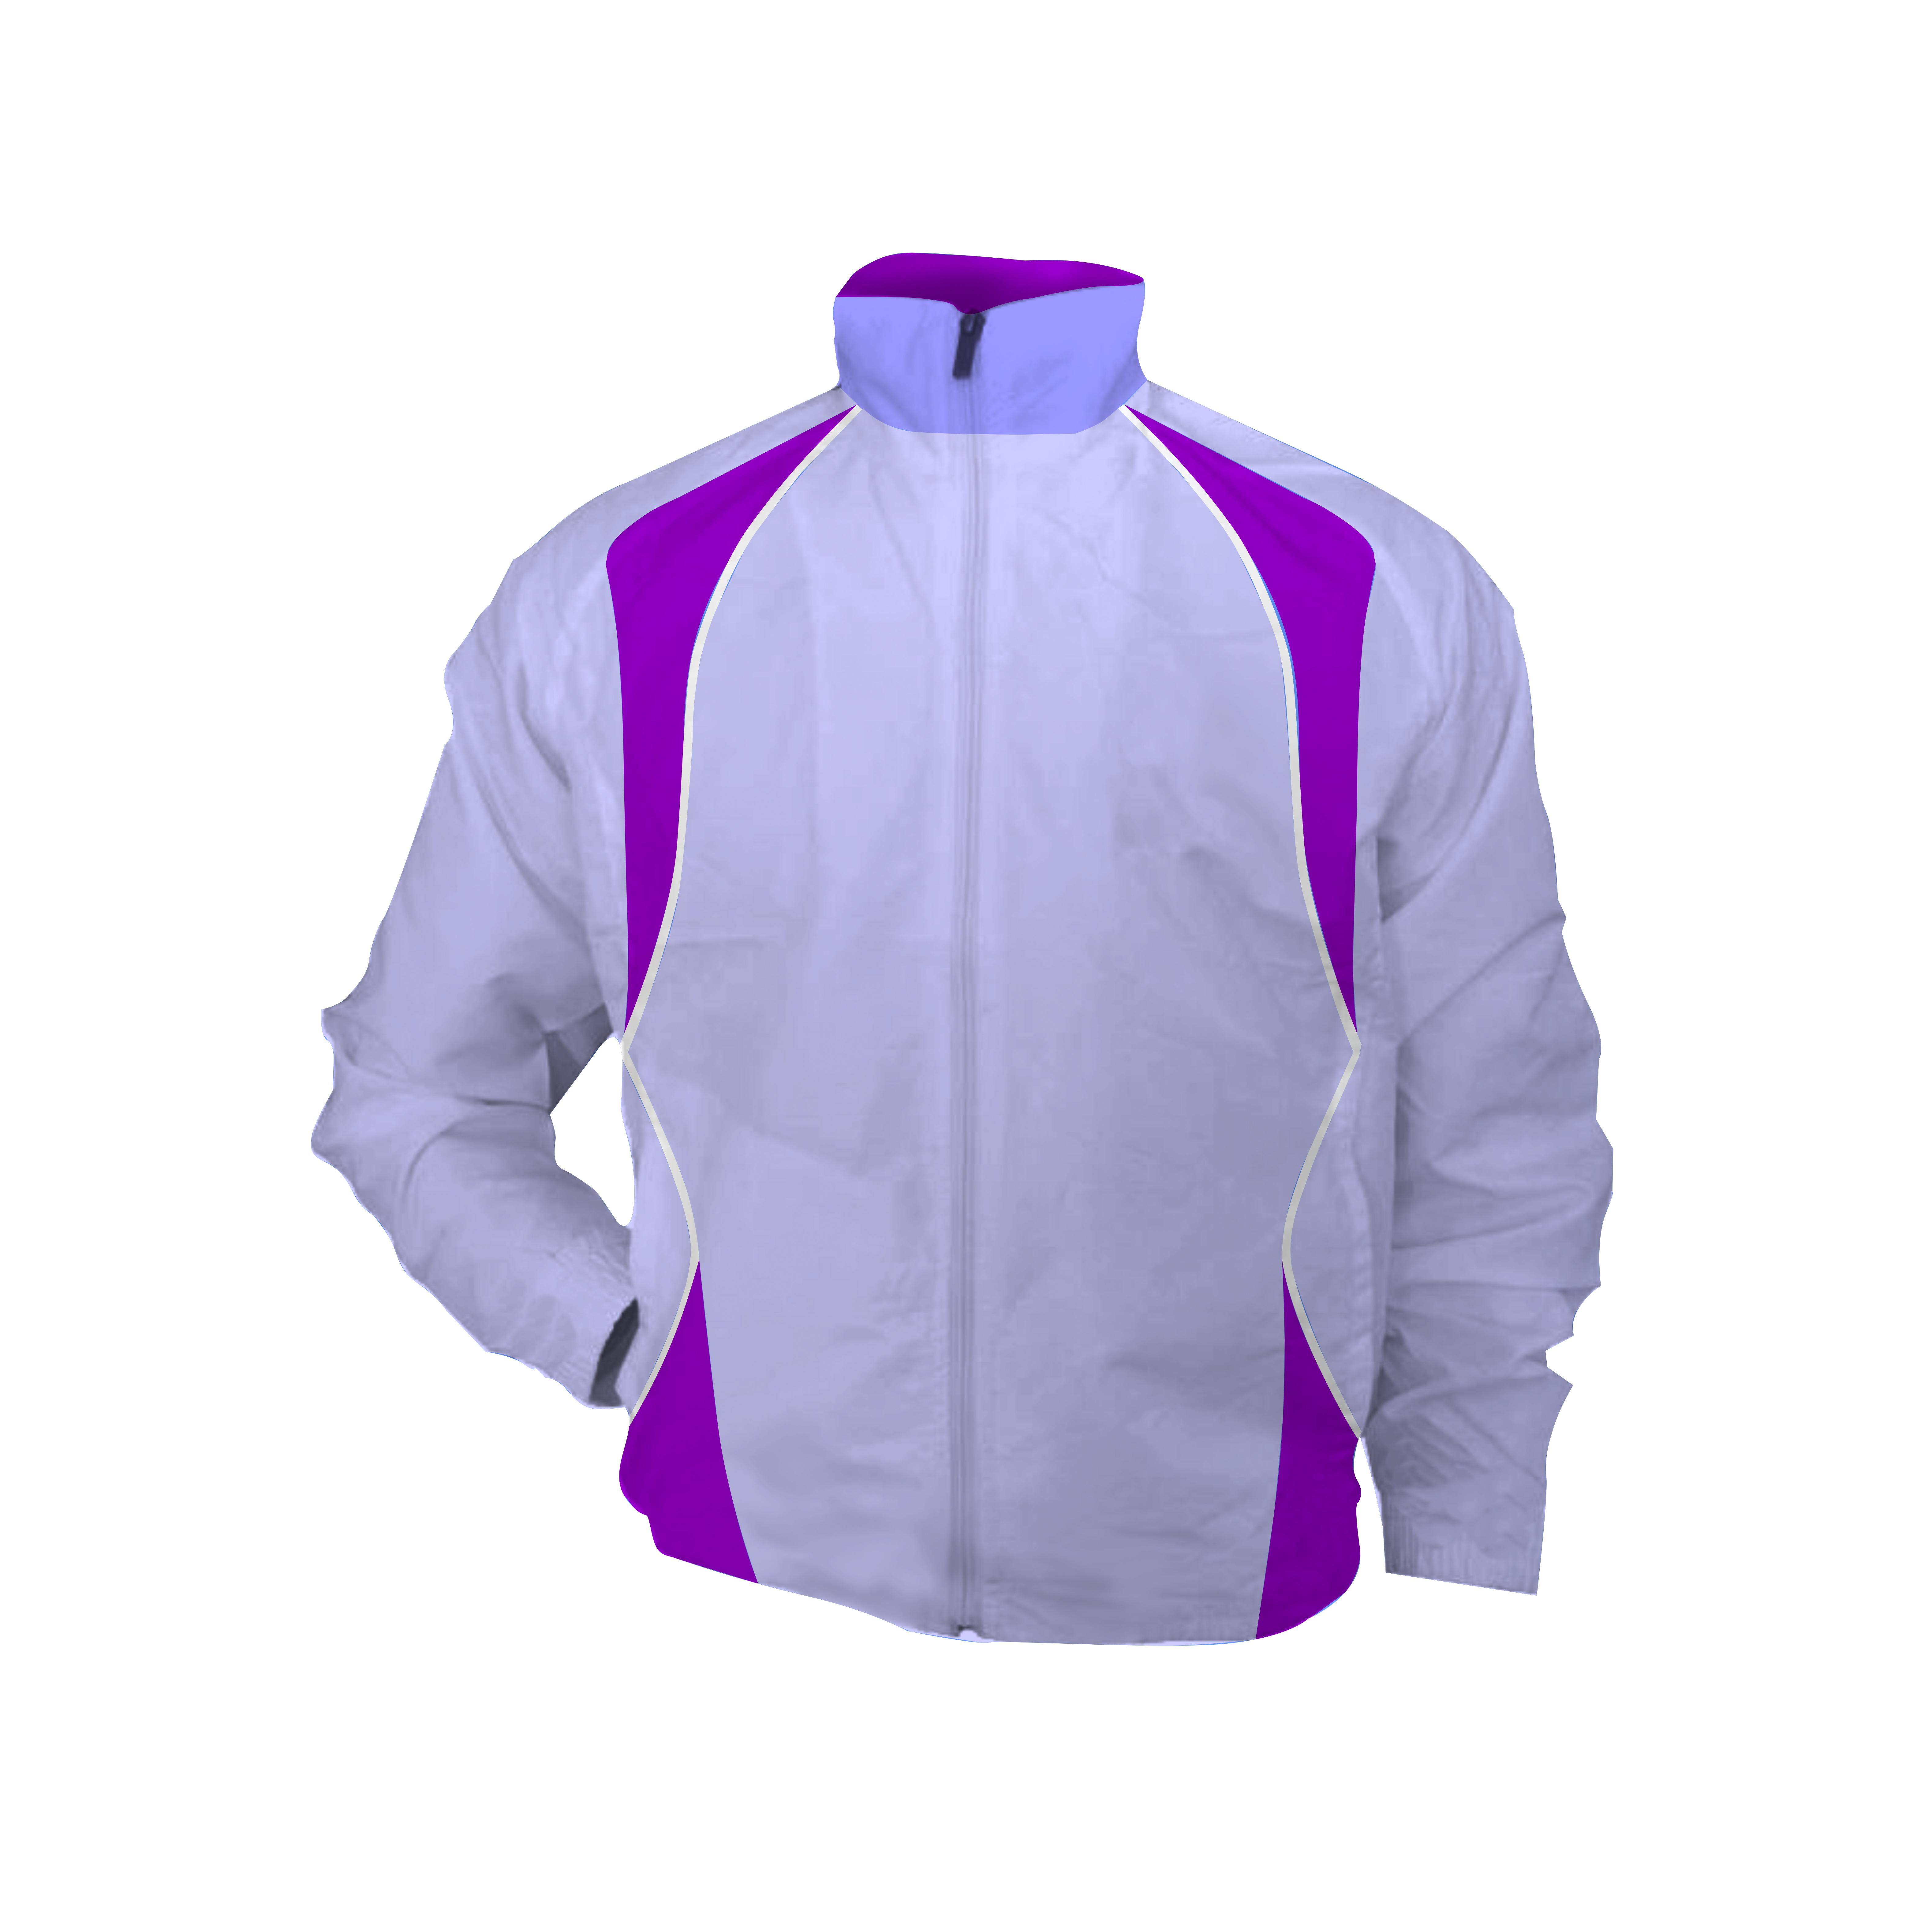 Panelled - bench jacket - Rick